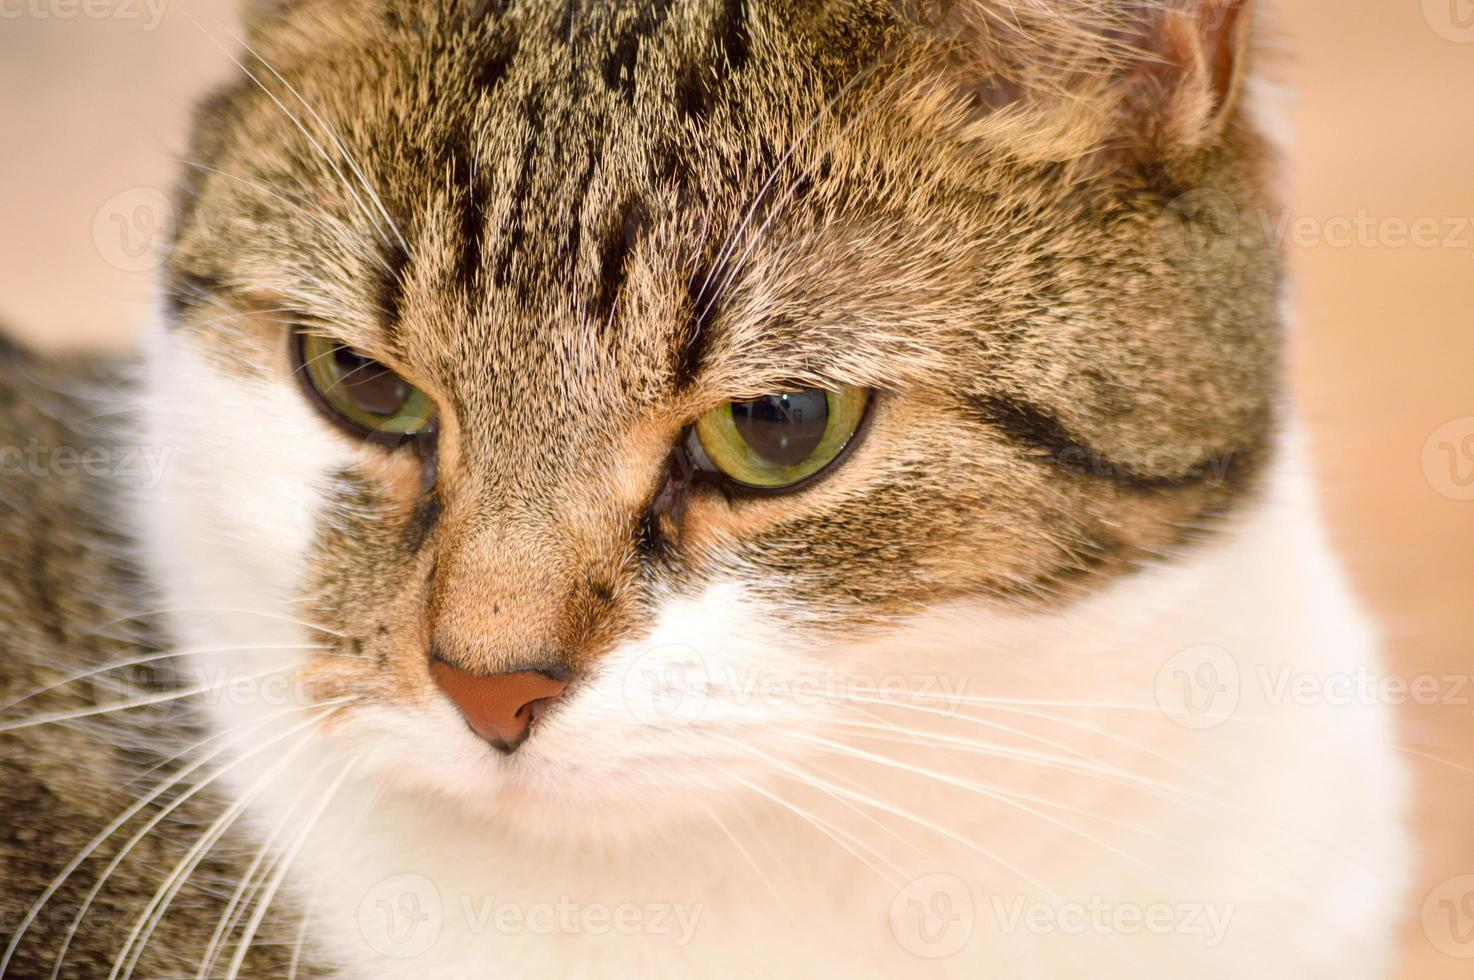 Tabby Cat Portrait photo